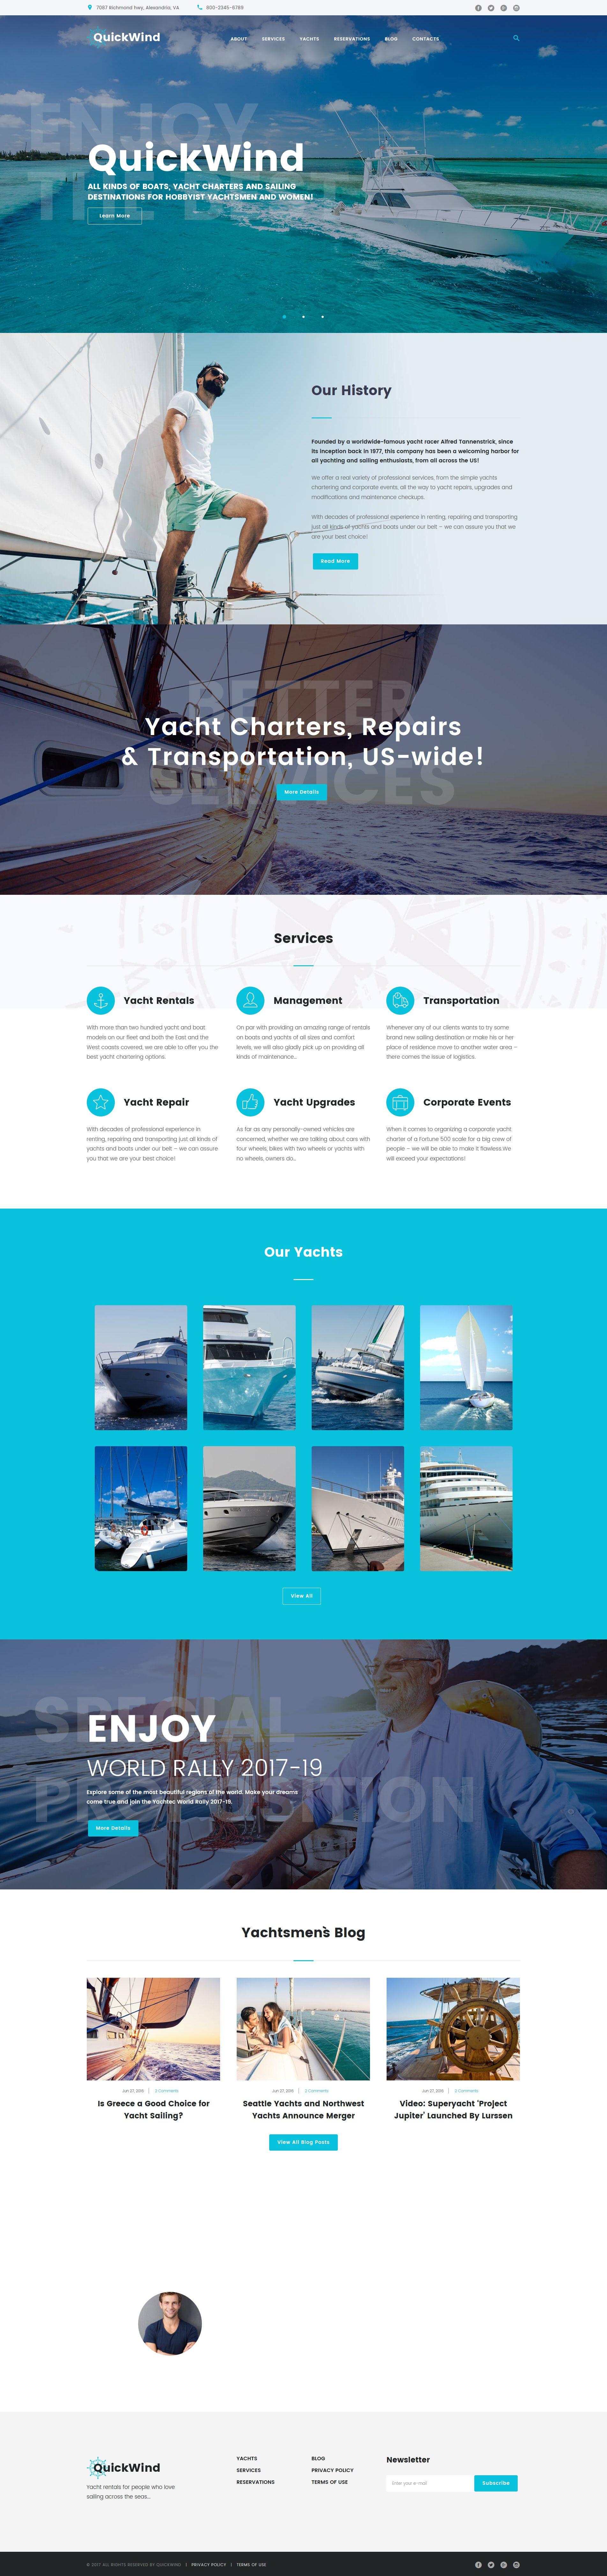 yachting amp voyage charter wordpress theme pinterest